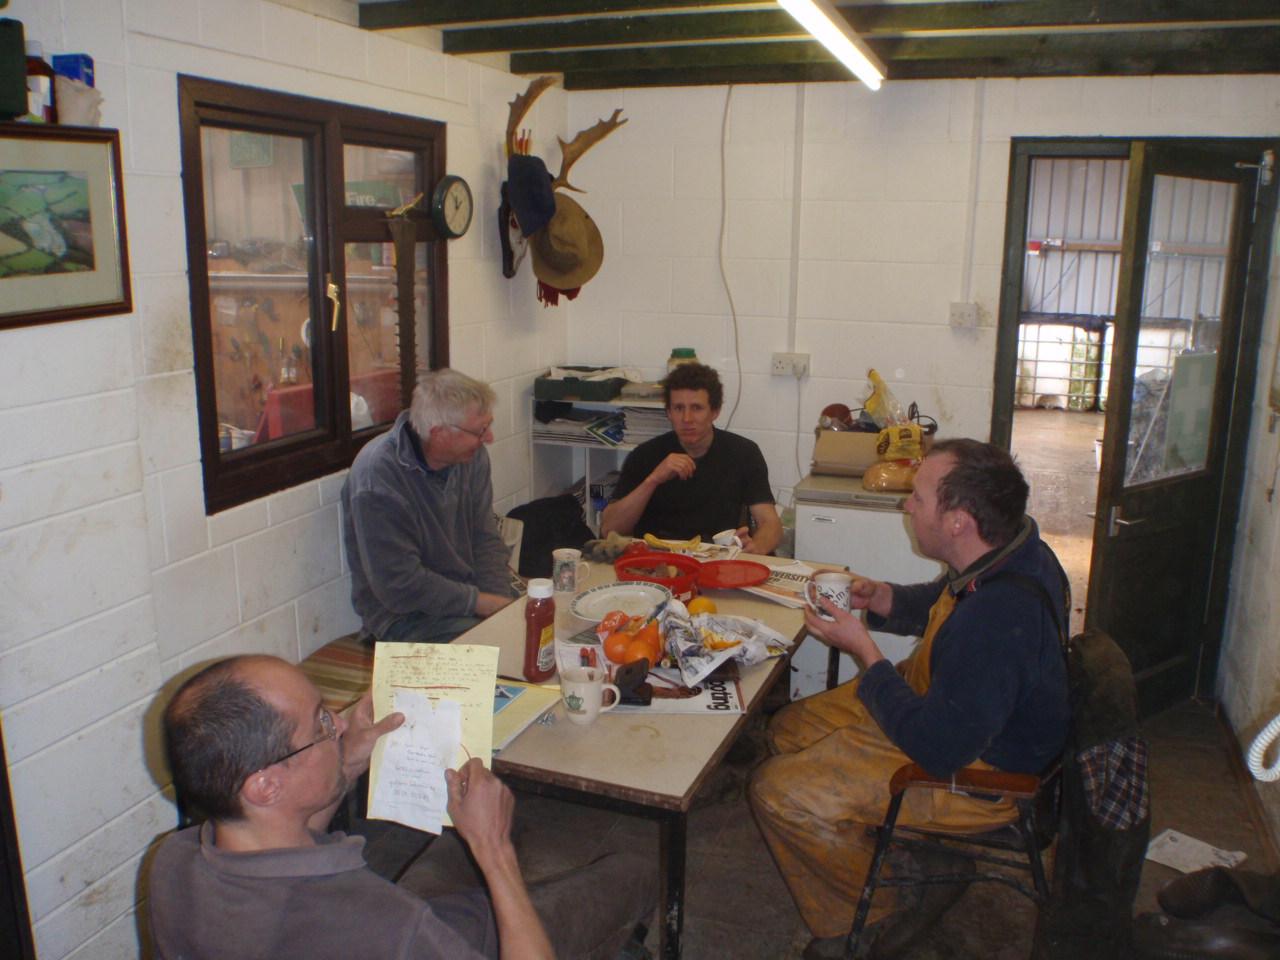 Staff room meeting